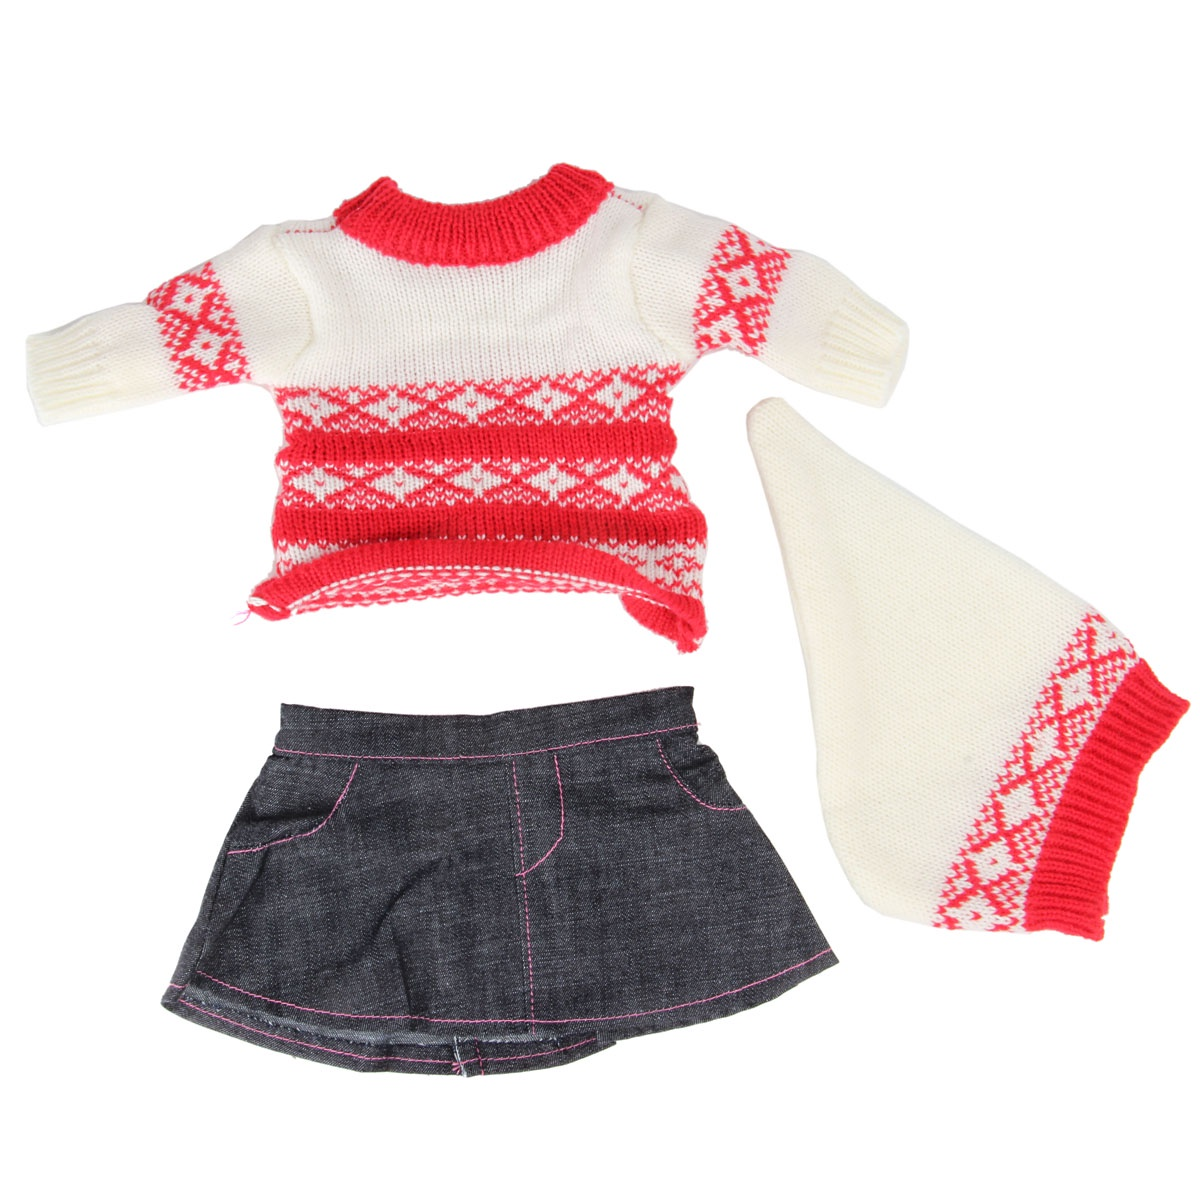 куклы и одежда для кукол asi одежда для кукол 60 см 0000092 Одежда для кукол Veld Co. 75902